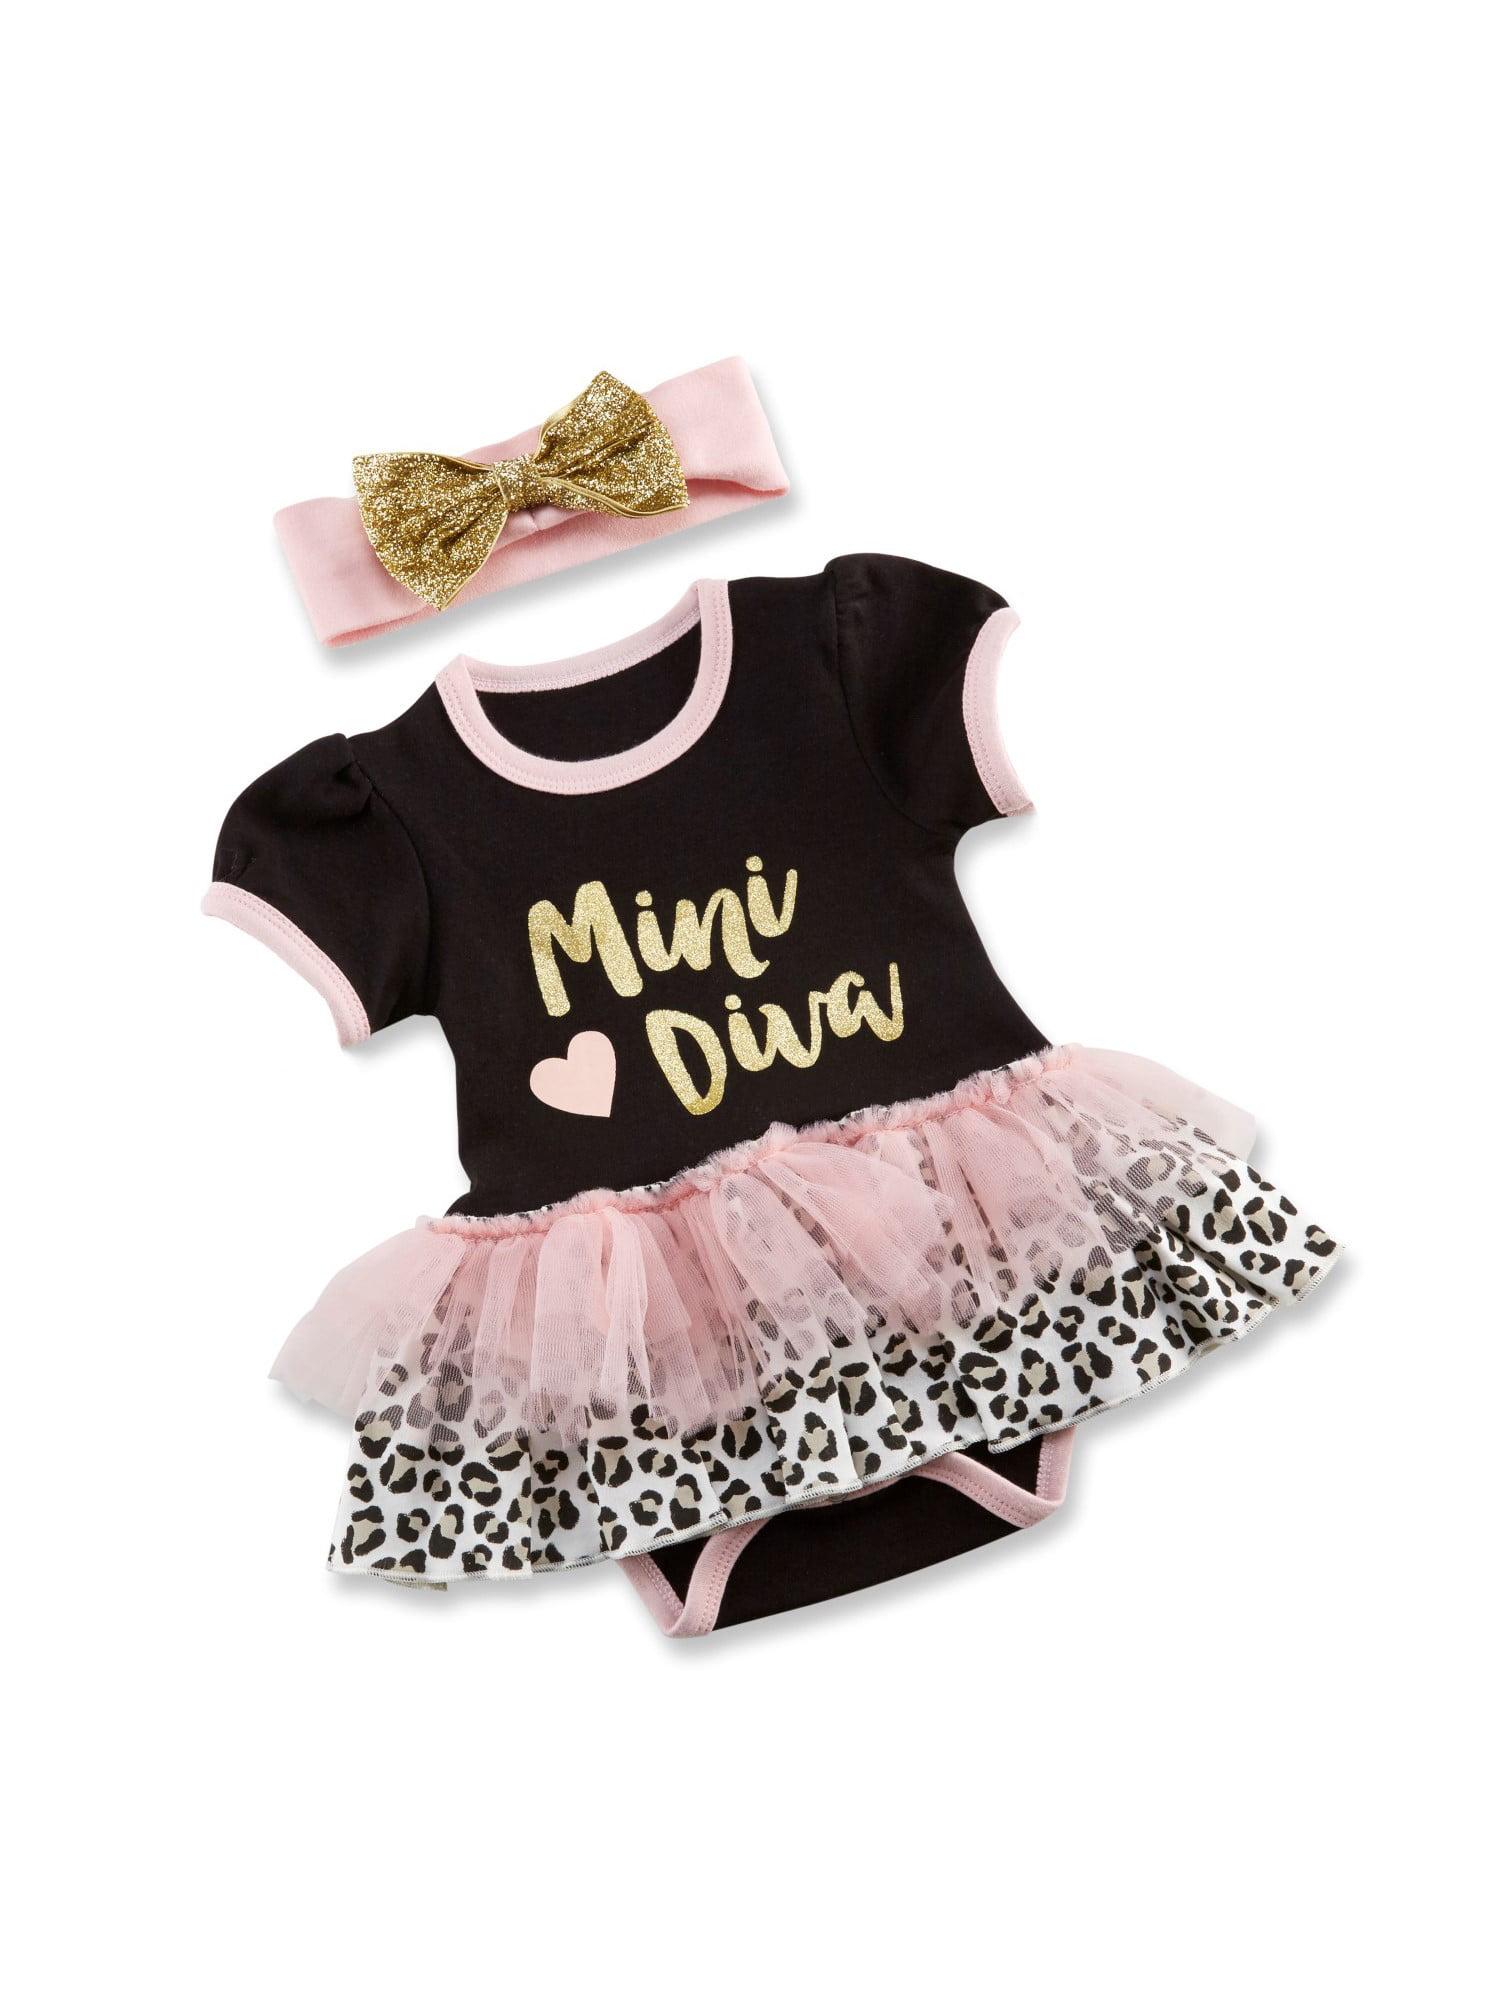 Baby Aspen Short Sleeve Dress & Headband, 2pc Outfit Set (Baby Girls) 0-6mo.